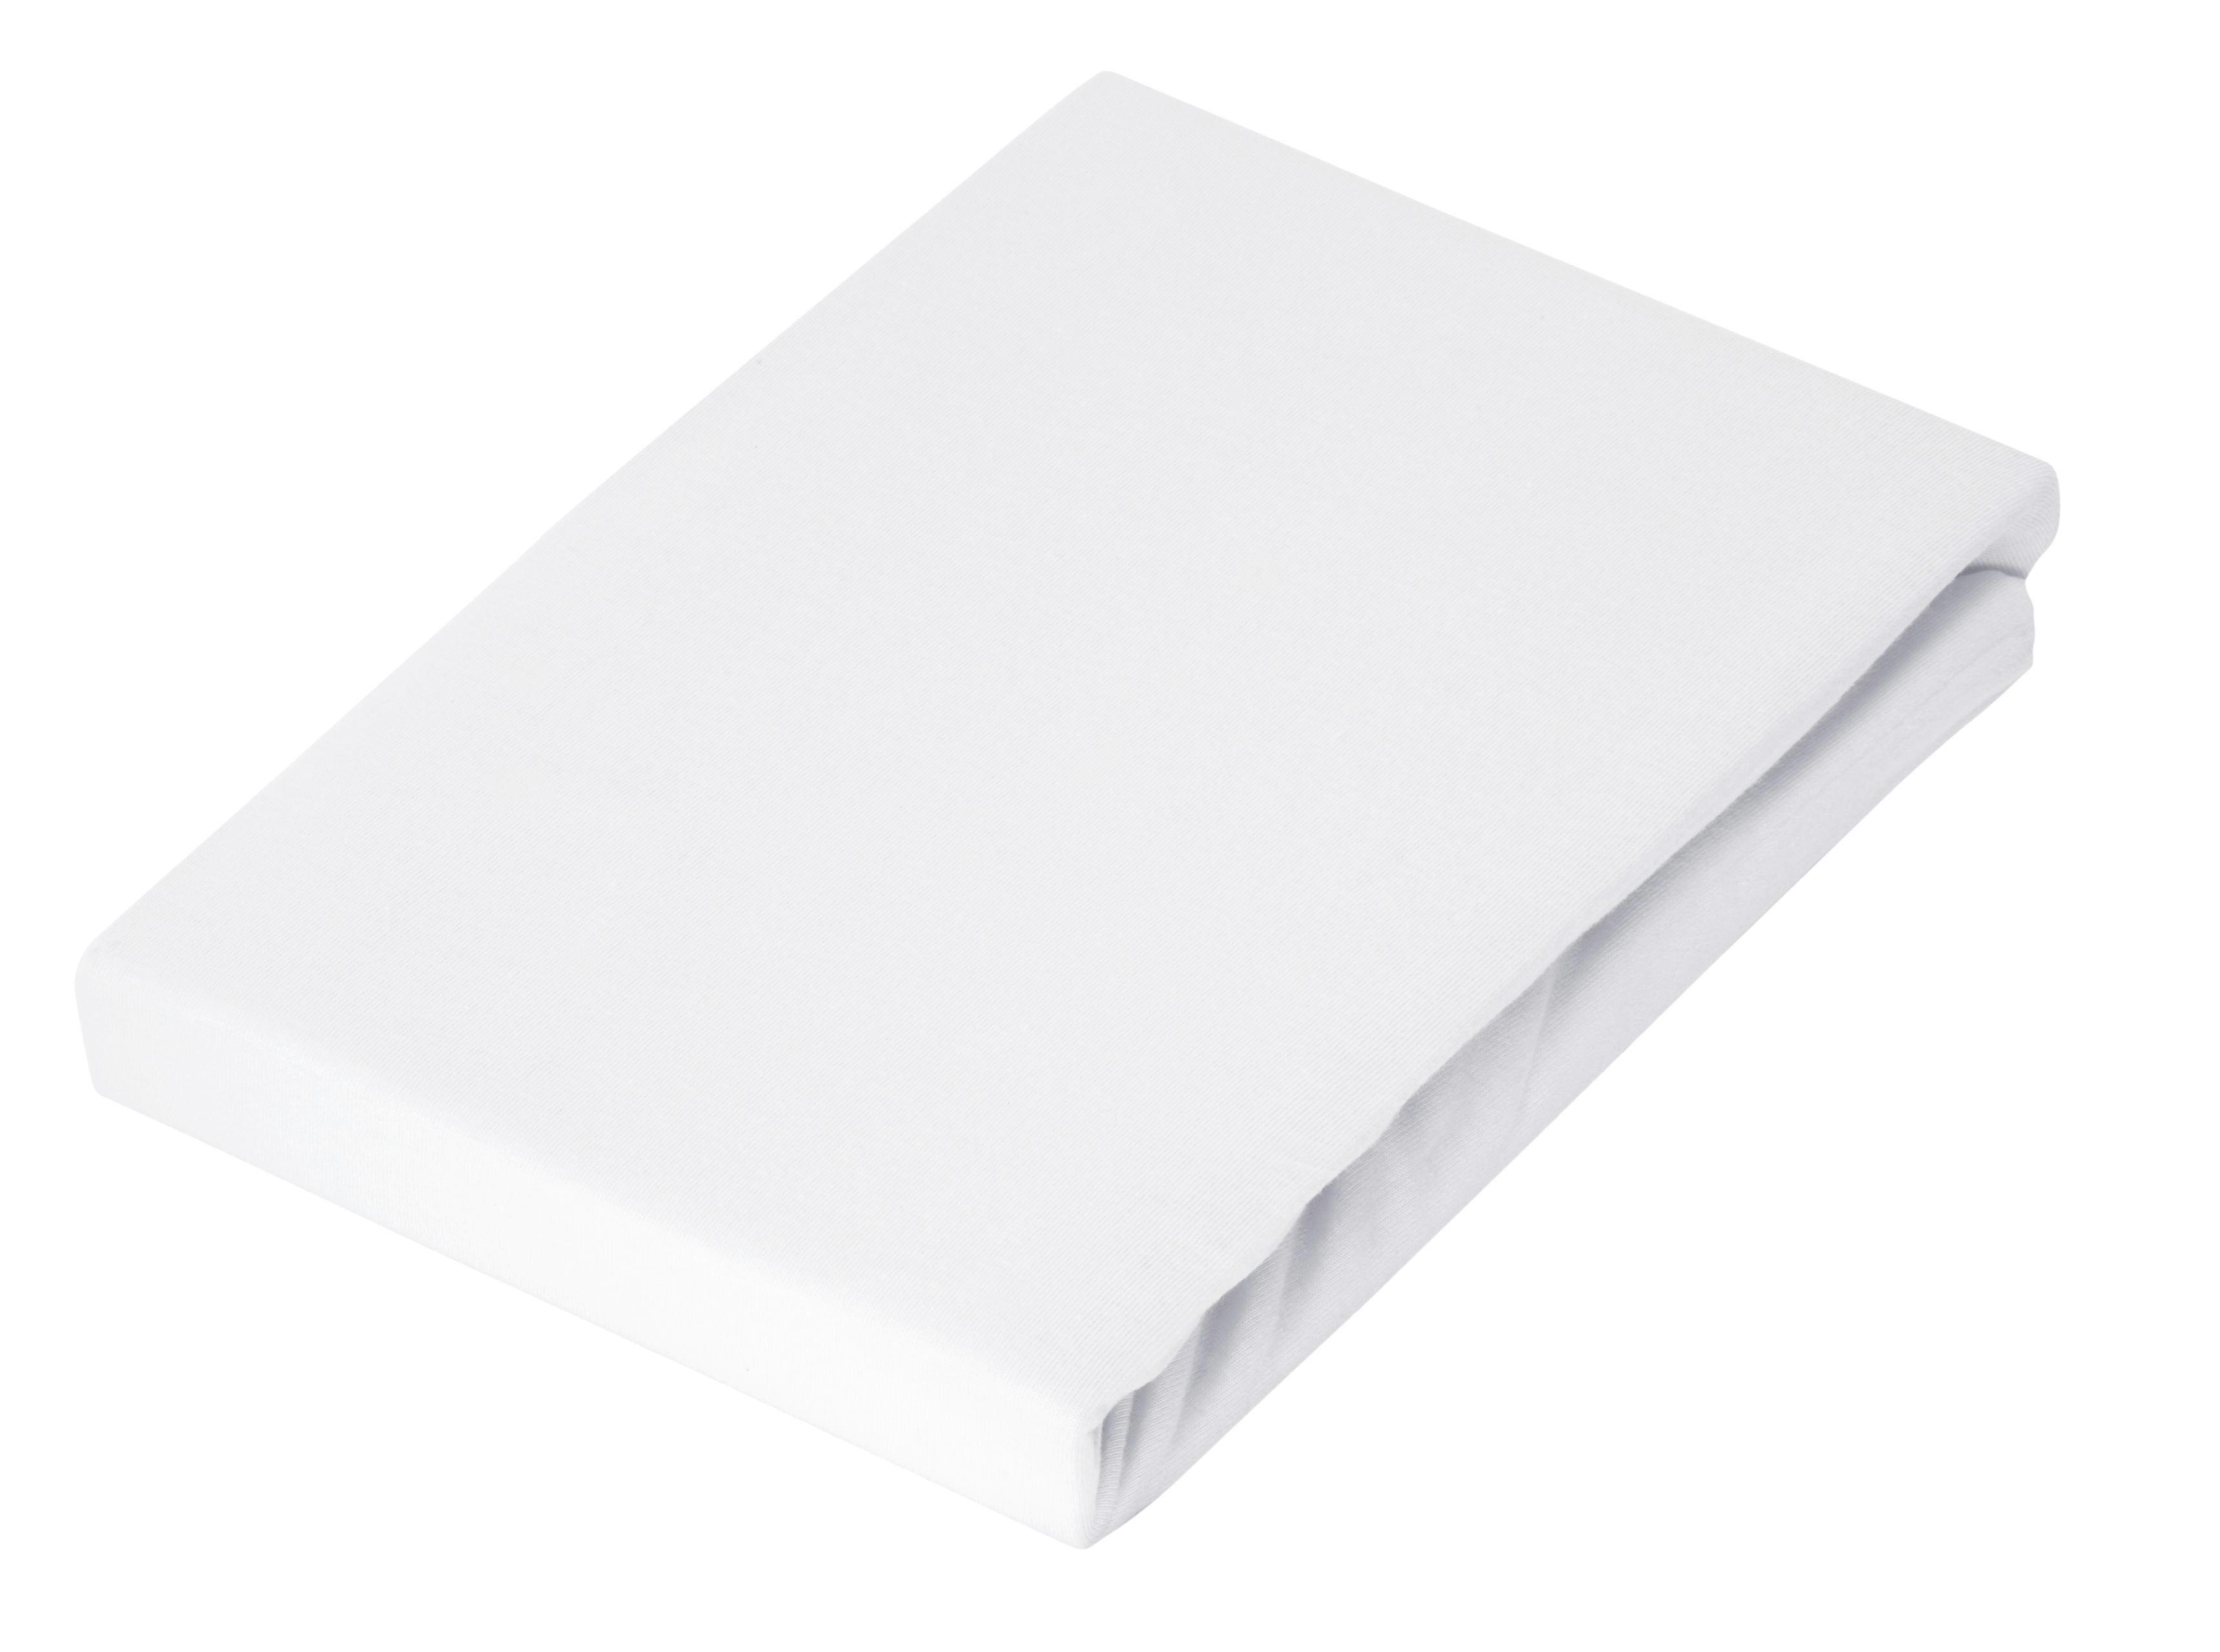 BETTTUCH 220/260 cm - Weiß, Textil (220/260cm) - SCHLAFGUT